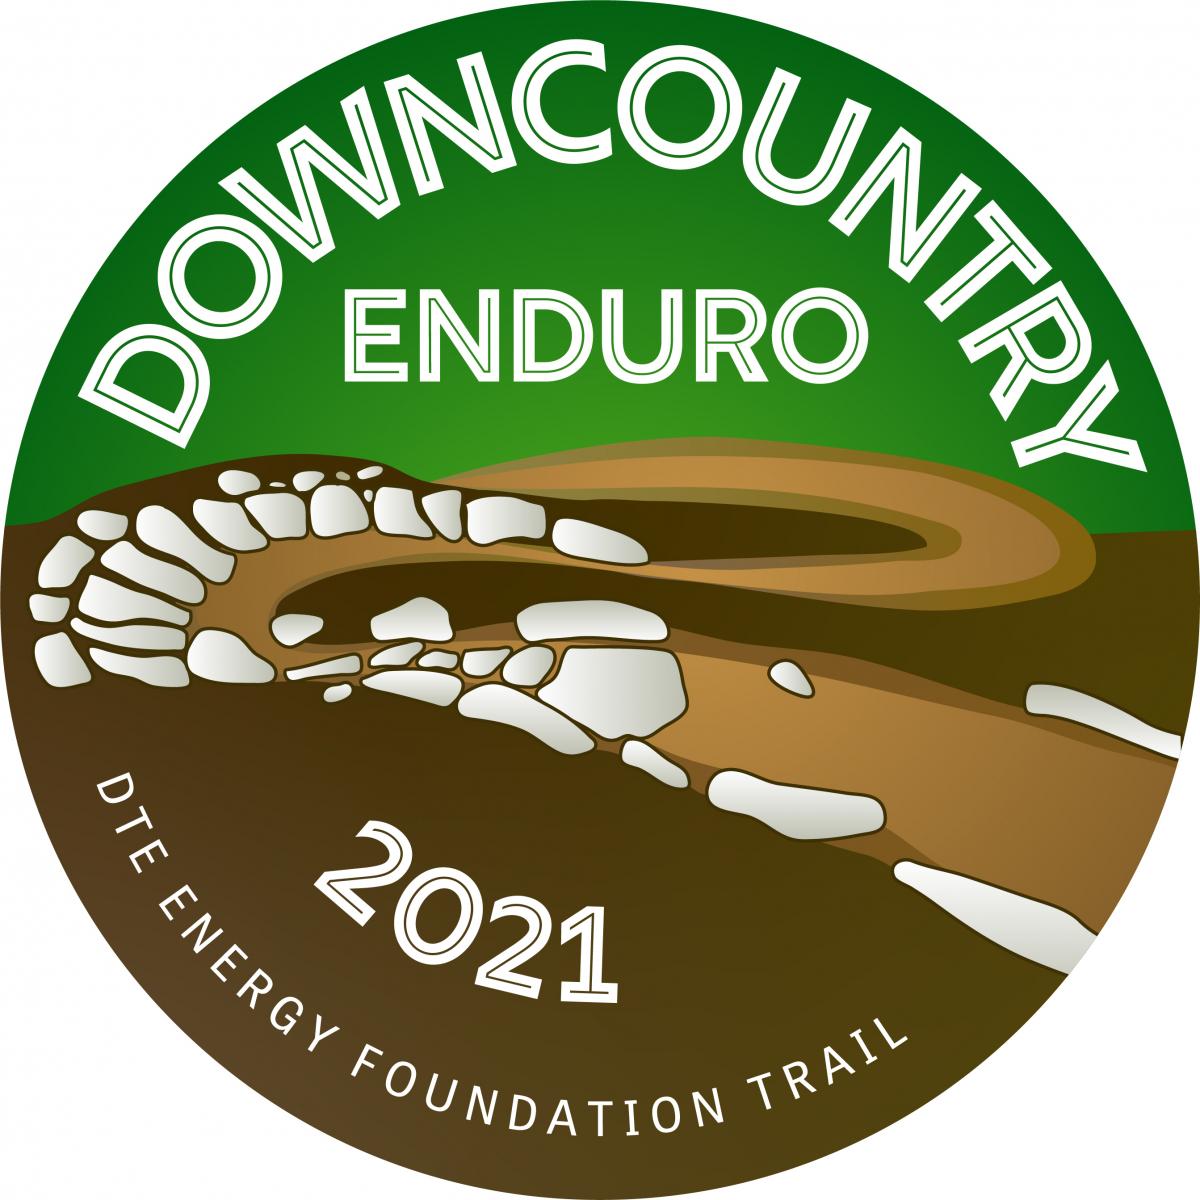 Downcountry Enduro